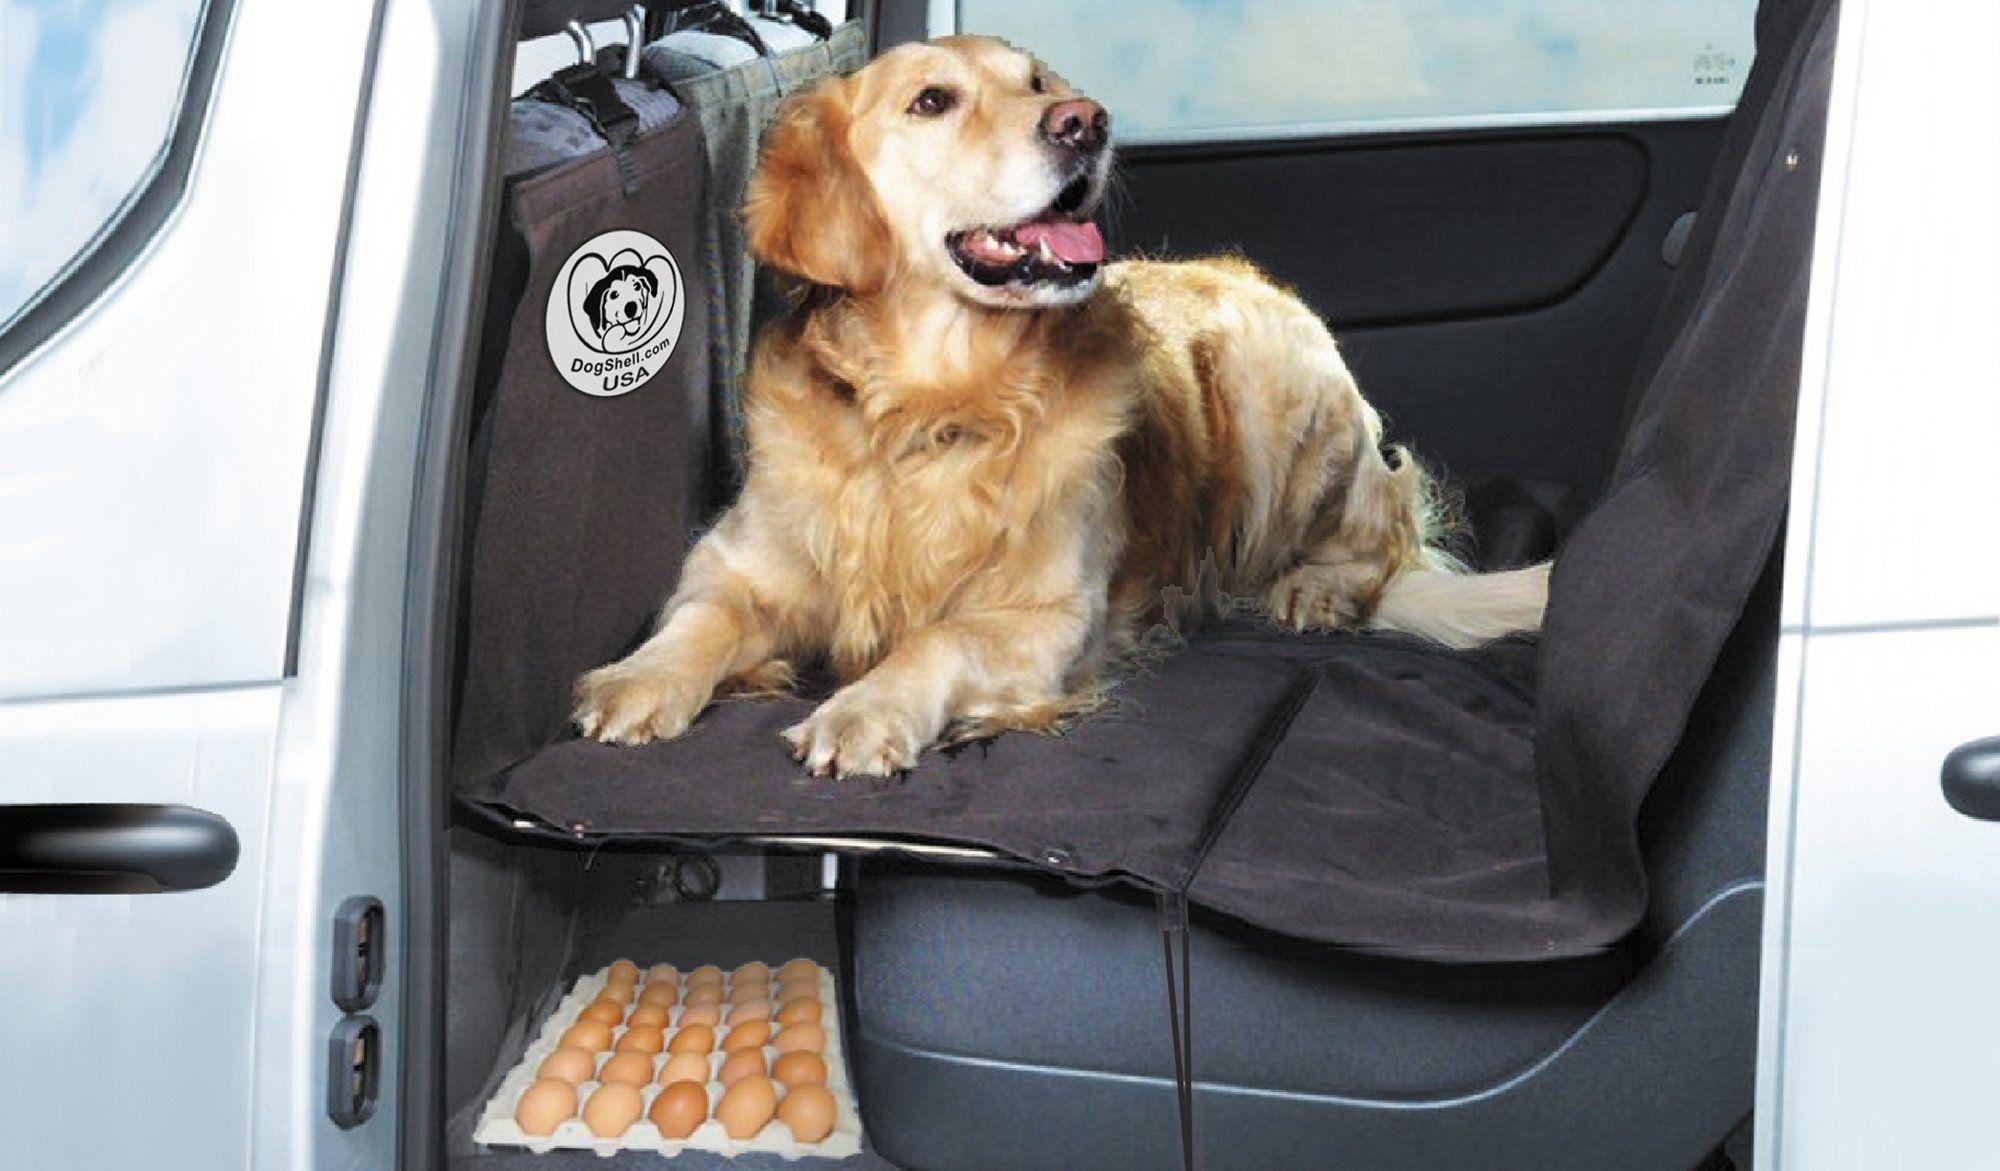 DogShell Car/SUV Dog Pet HeavyDuty Back Seat Cover